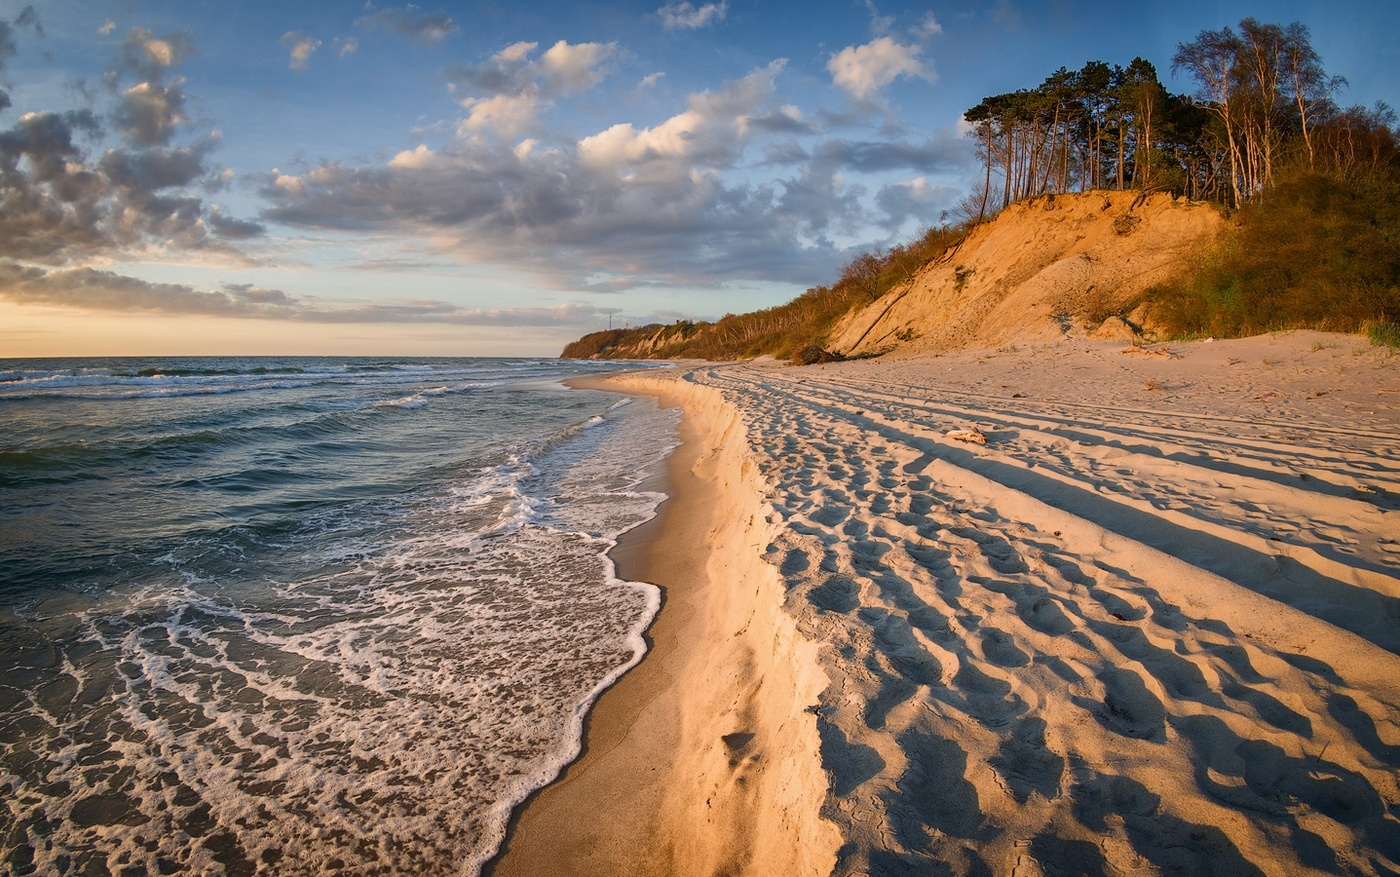 Маю, картинки балтийского моря